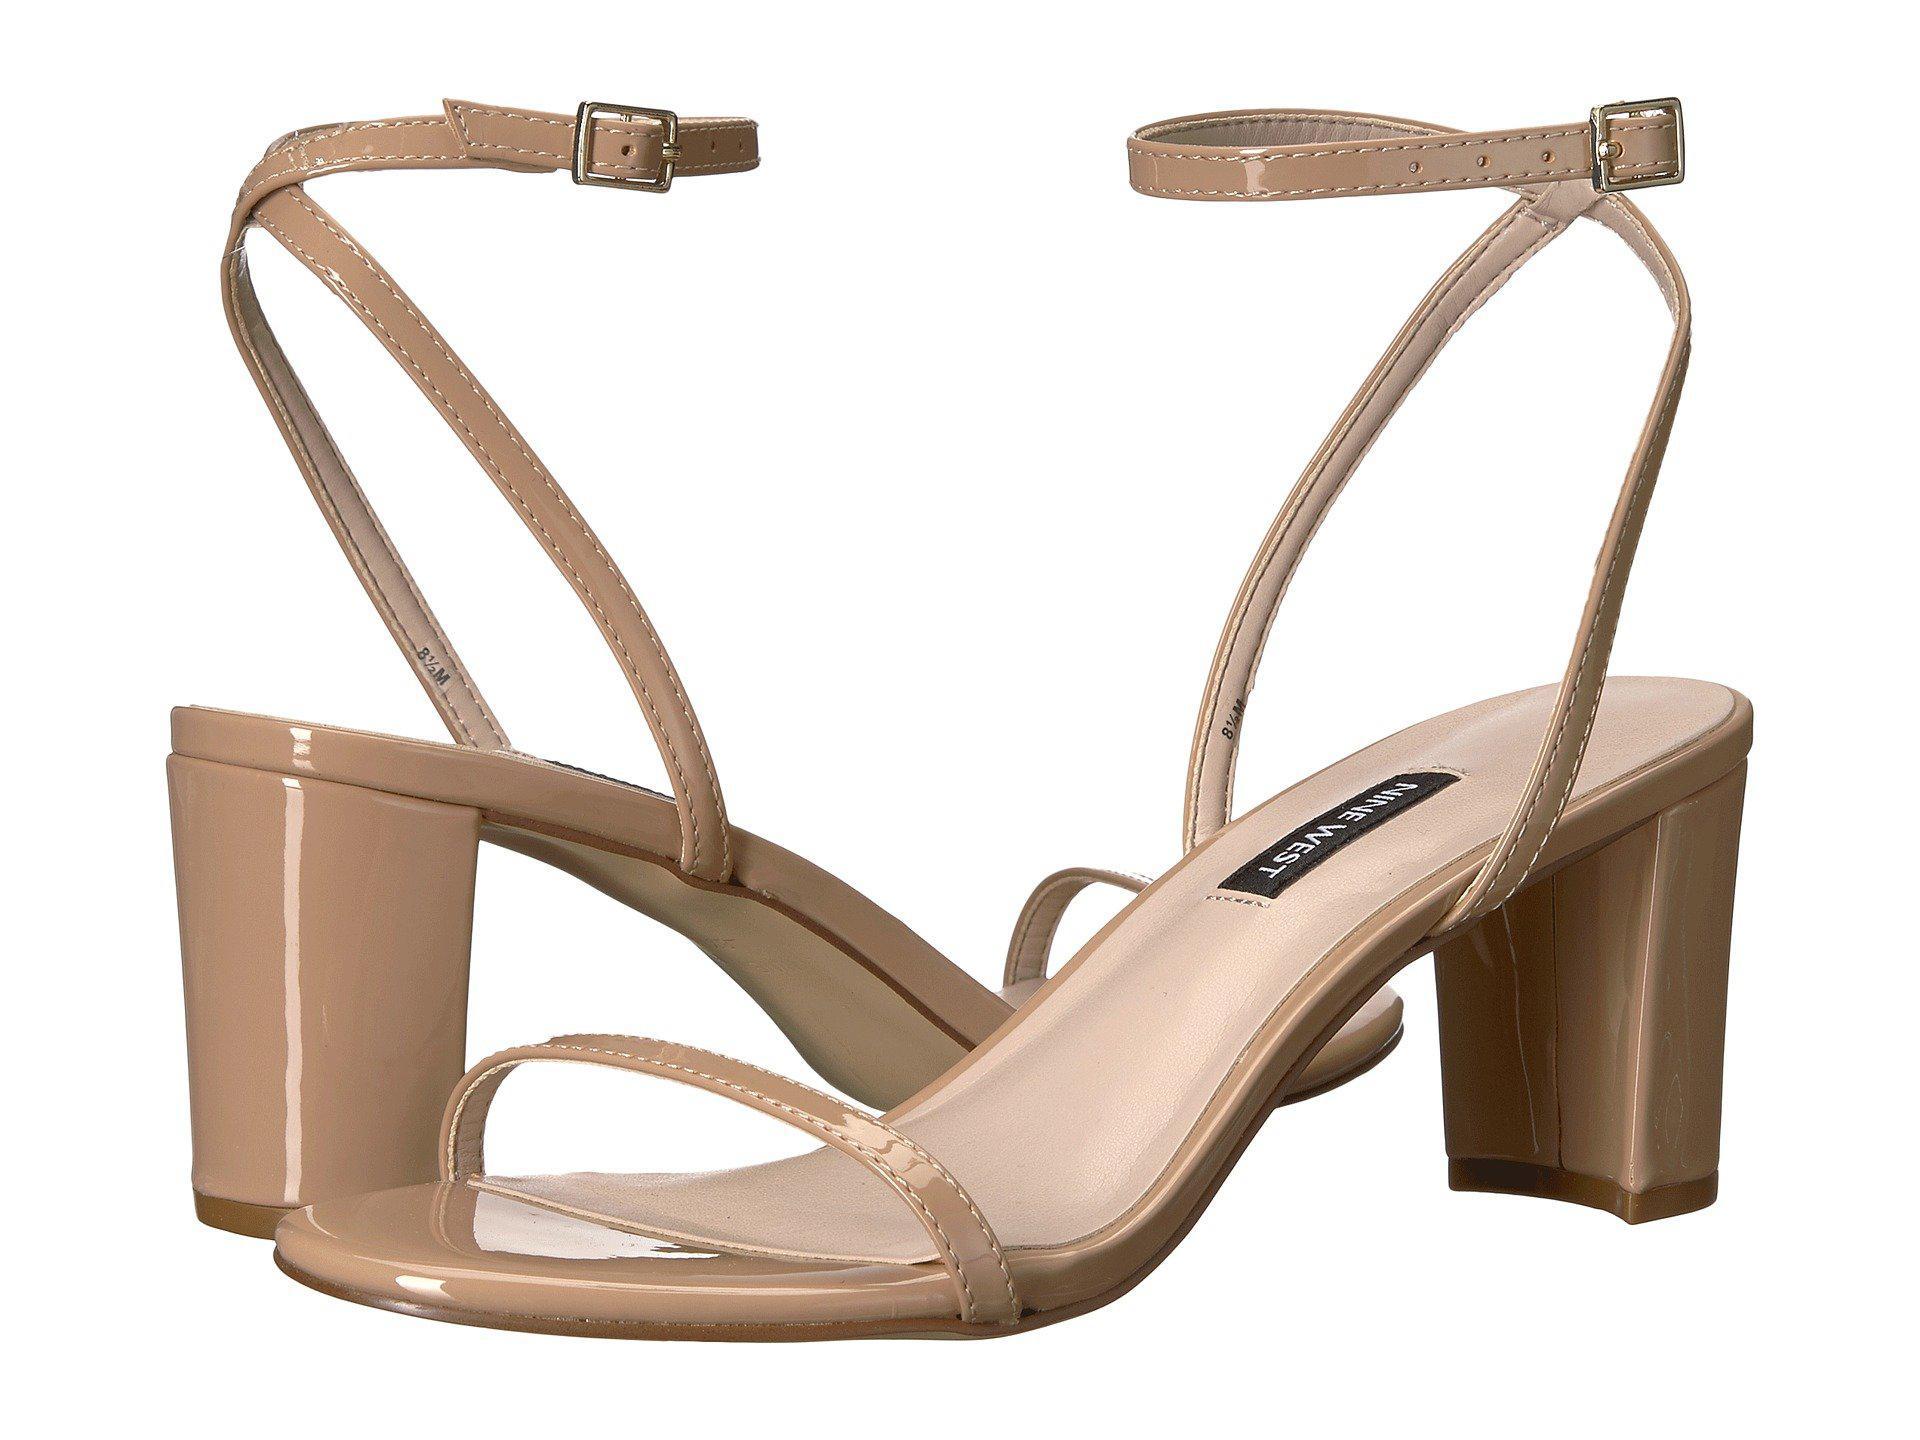 efebc590e26 Lyst - Nine West Provein Block Heel Sandal in Natural - Save 40%